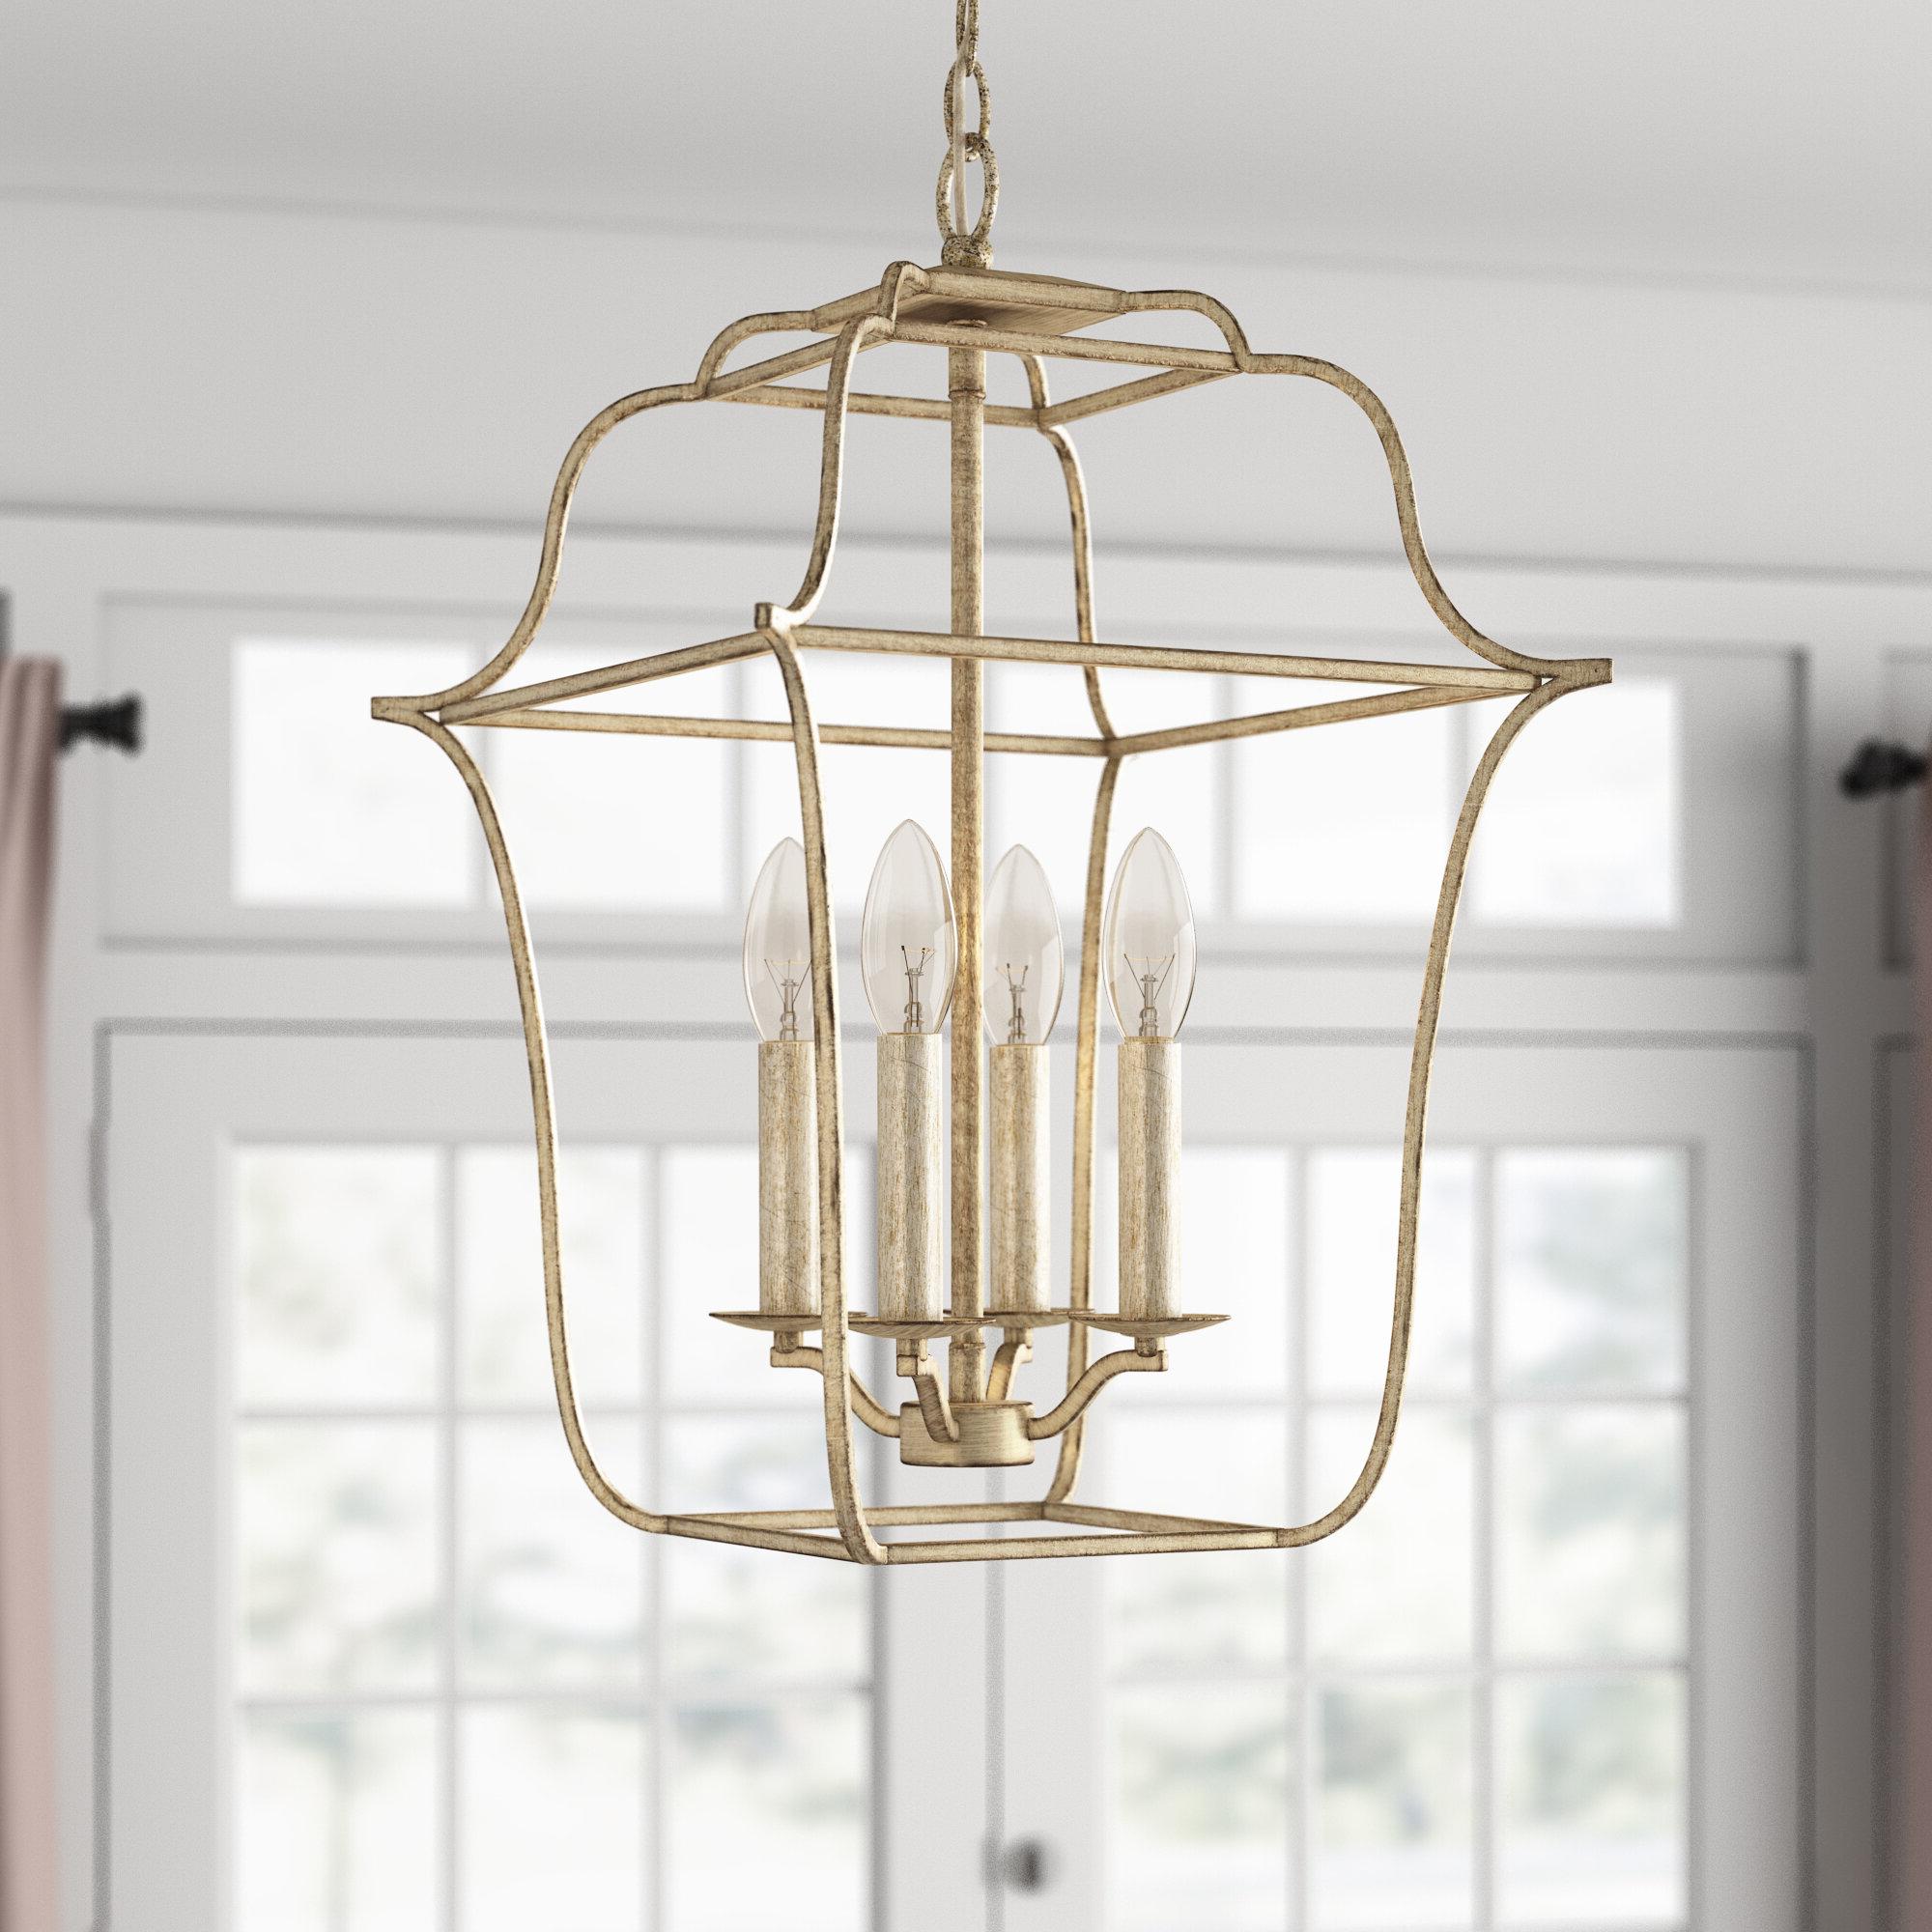 Armande 4 Light Lantern Drum Pendants With Trendy Chloe 4 Light Lantern Geometric Pendant (View 10 of 20)